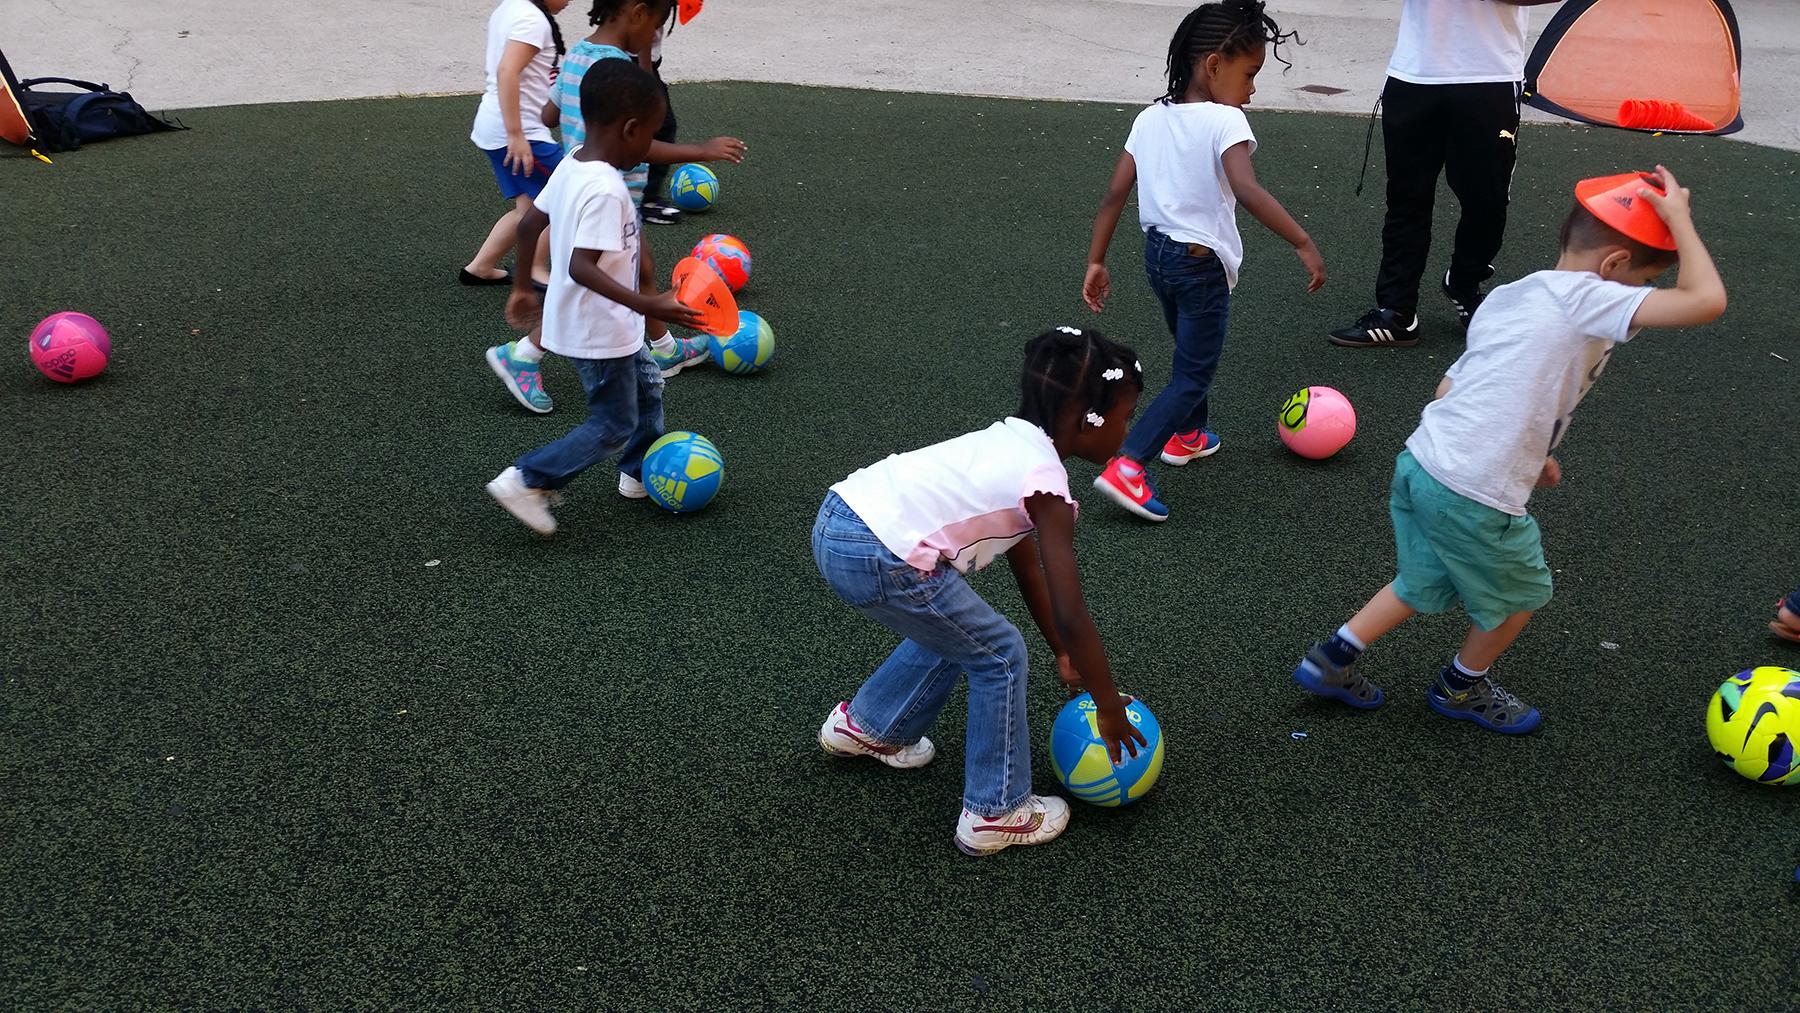 Universal Kids Soccer - Universal Kids Soccer - Soccer instructions